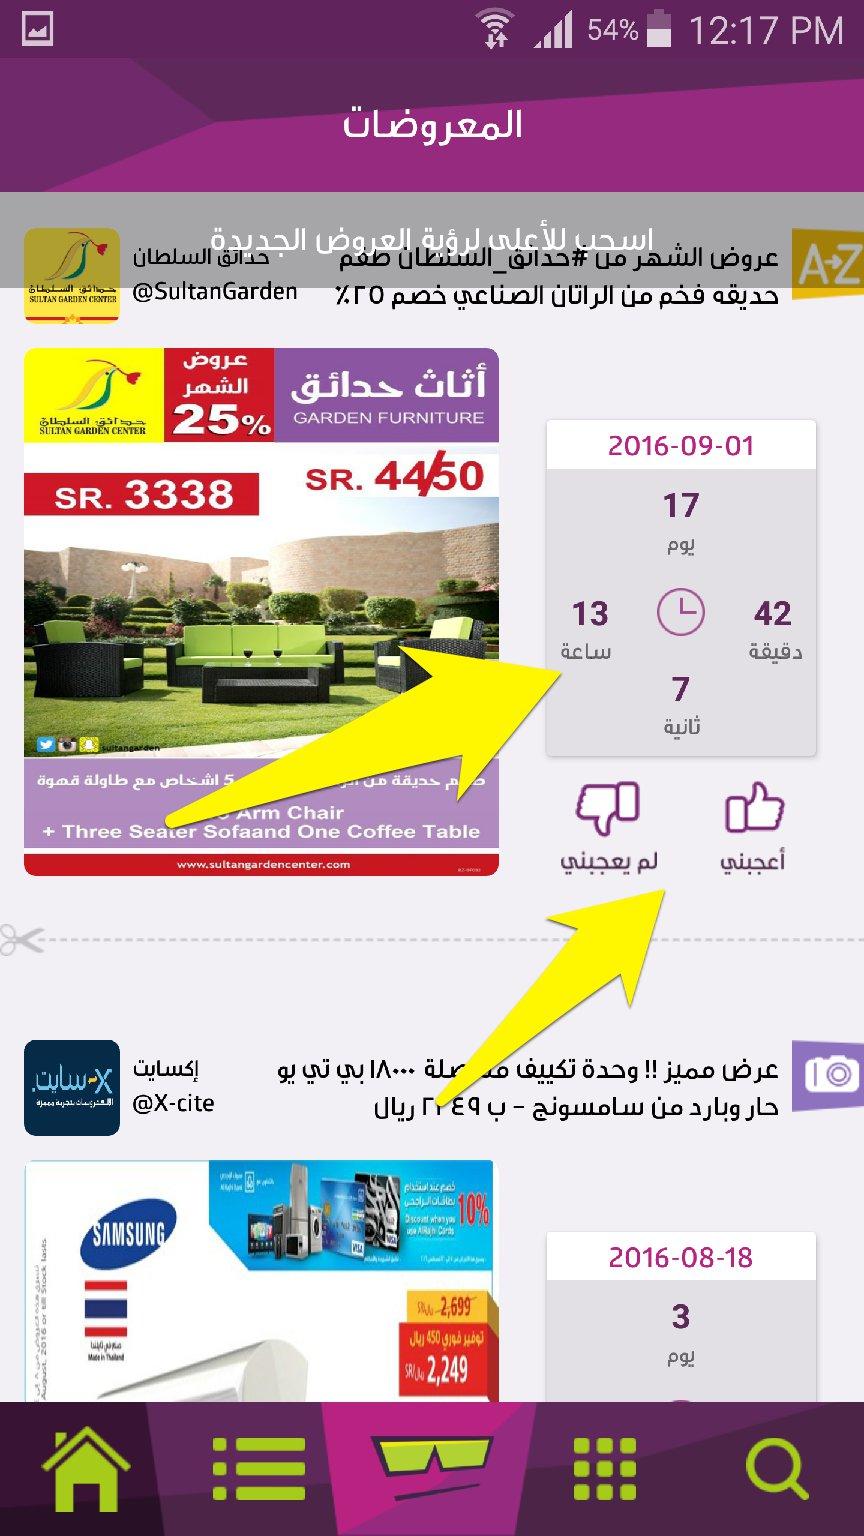 Feeedz فيييدز وفّر وقتك وابحث عن افضل العروض في السعودية | بحرية درويد